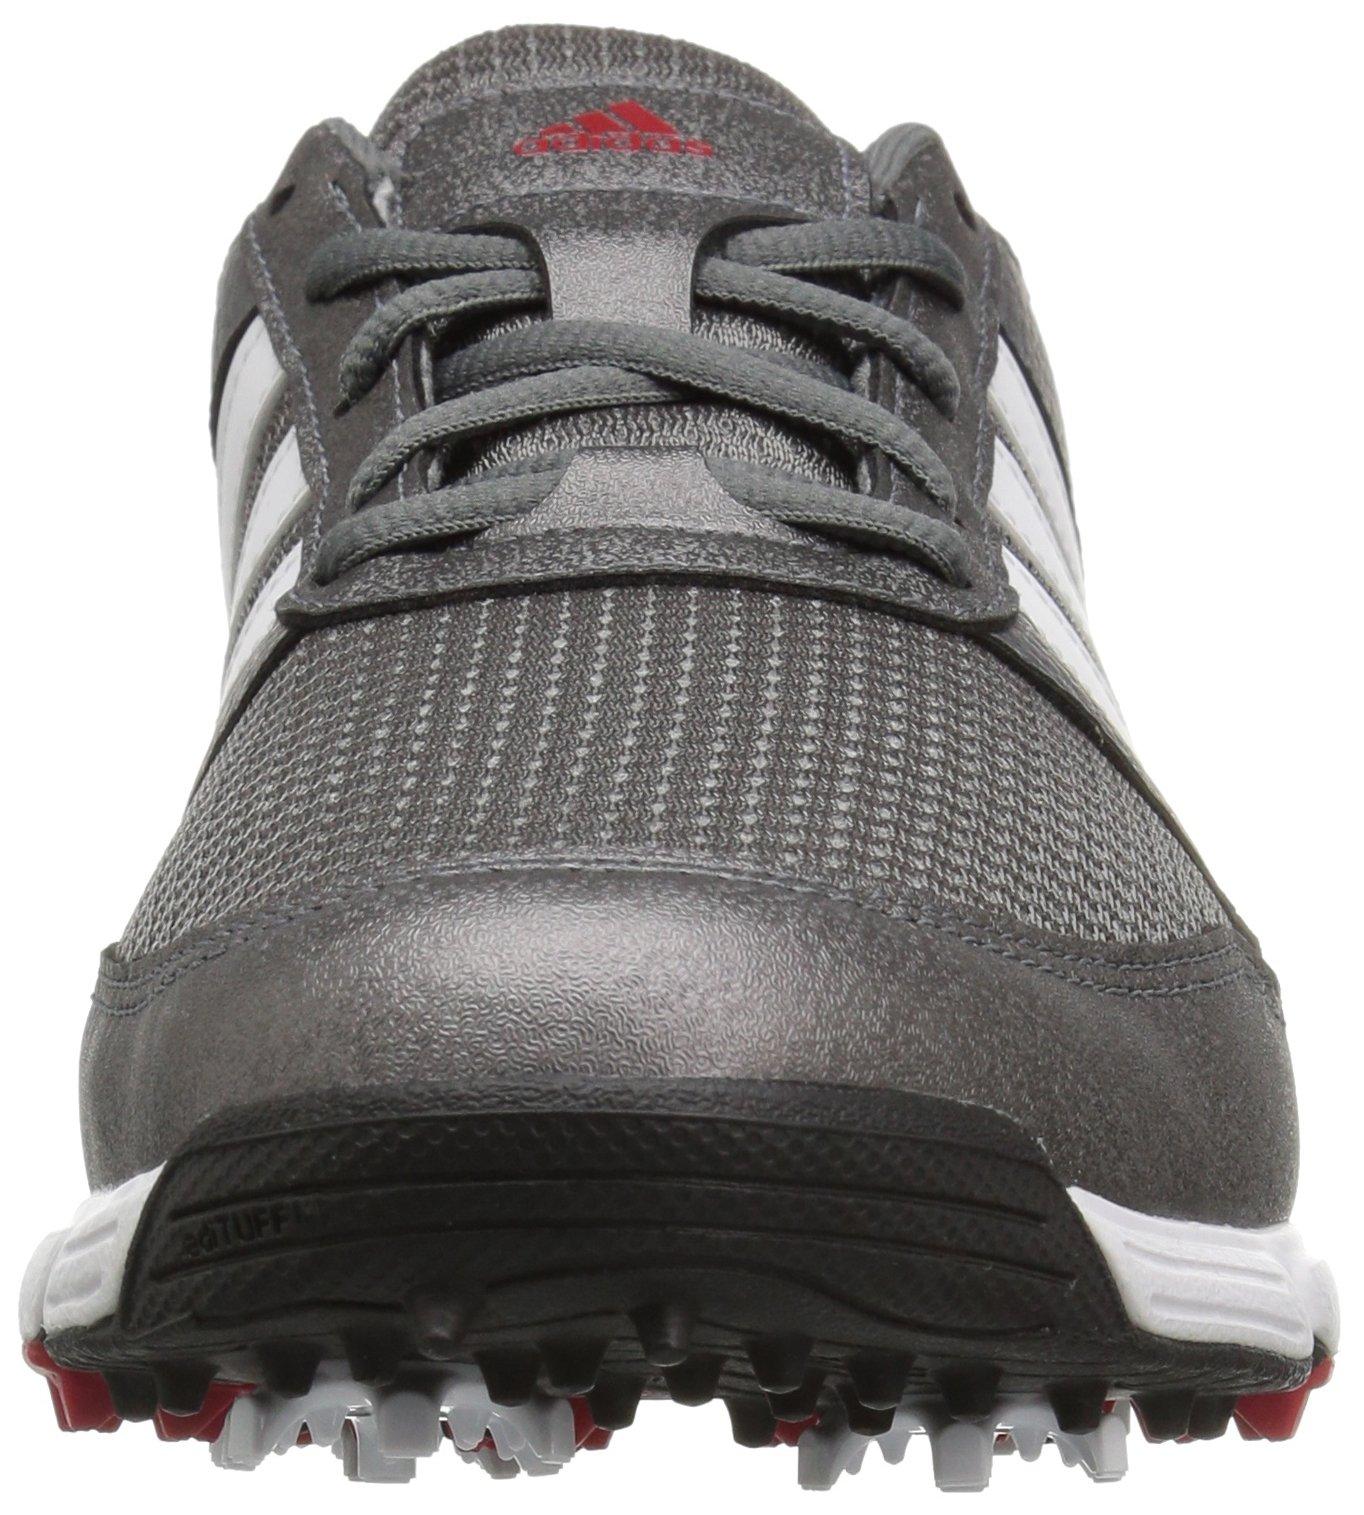 adidas Men's Tech Response Golf Shoe, Iron Metallic/White, 8.5 W US by adidas (Image #4)